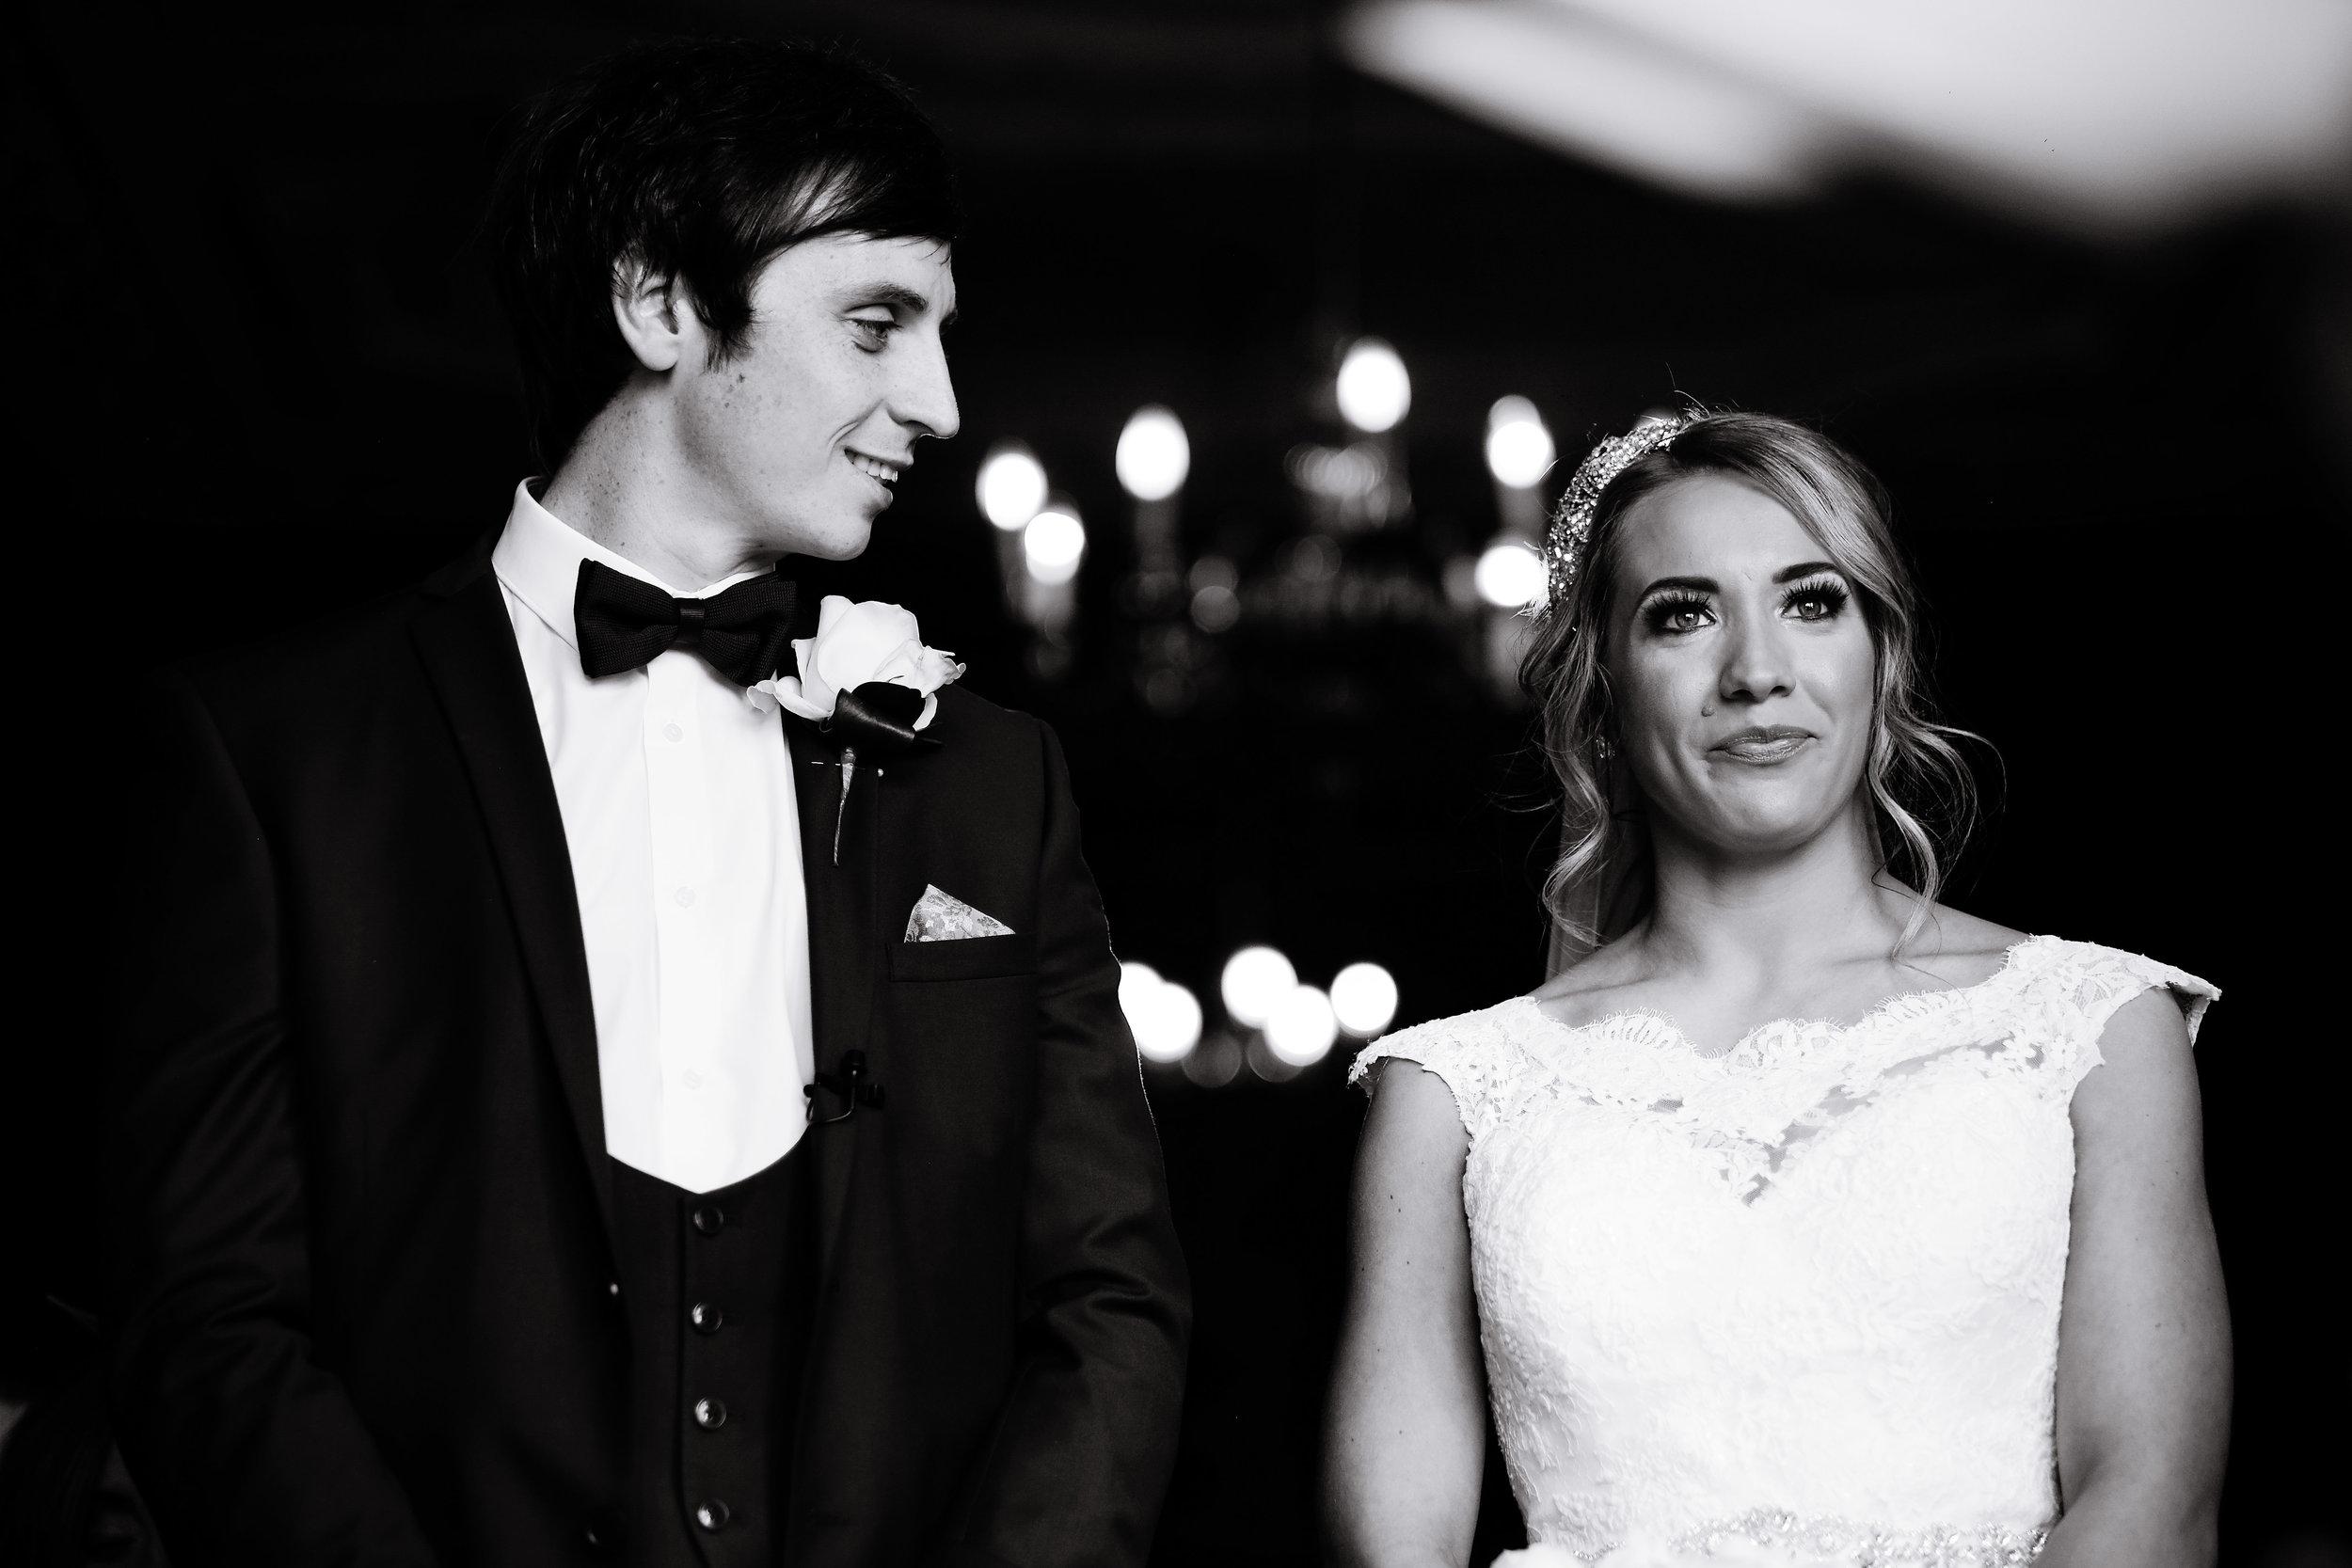 Thornton manor wedding photography cheshire wedding photographer liverpool manchester warrington chester wirral wedding BLOG (38 of 108).jpg